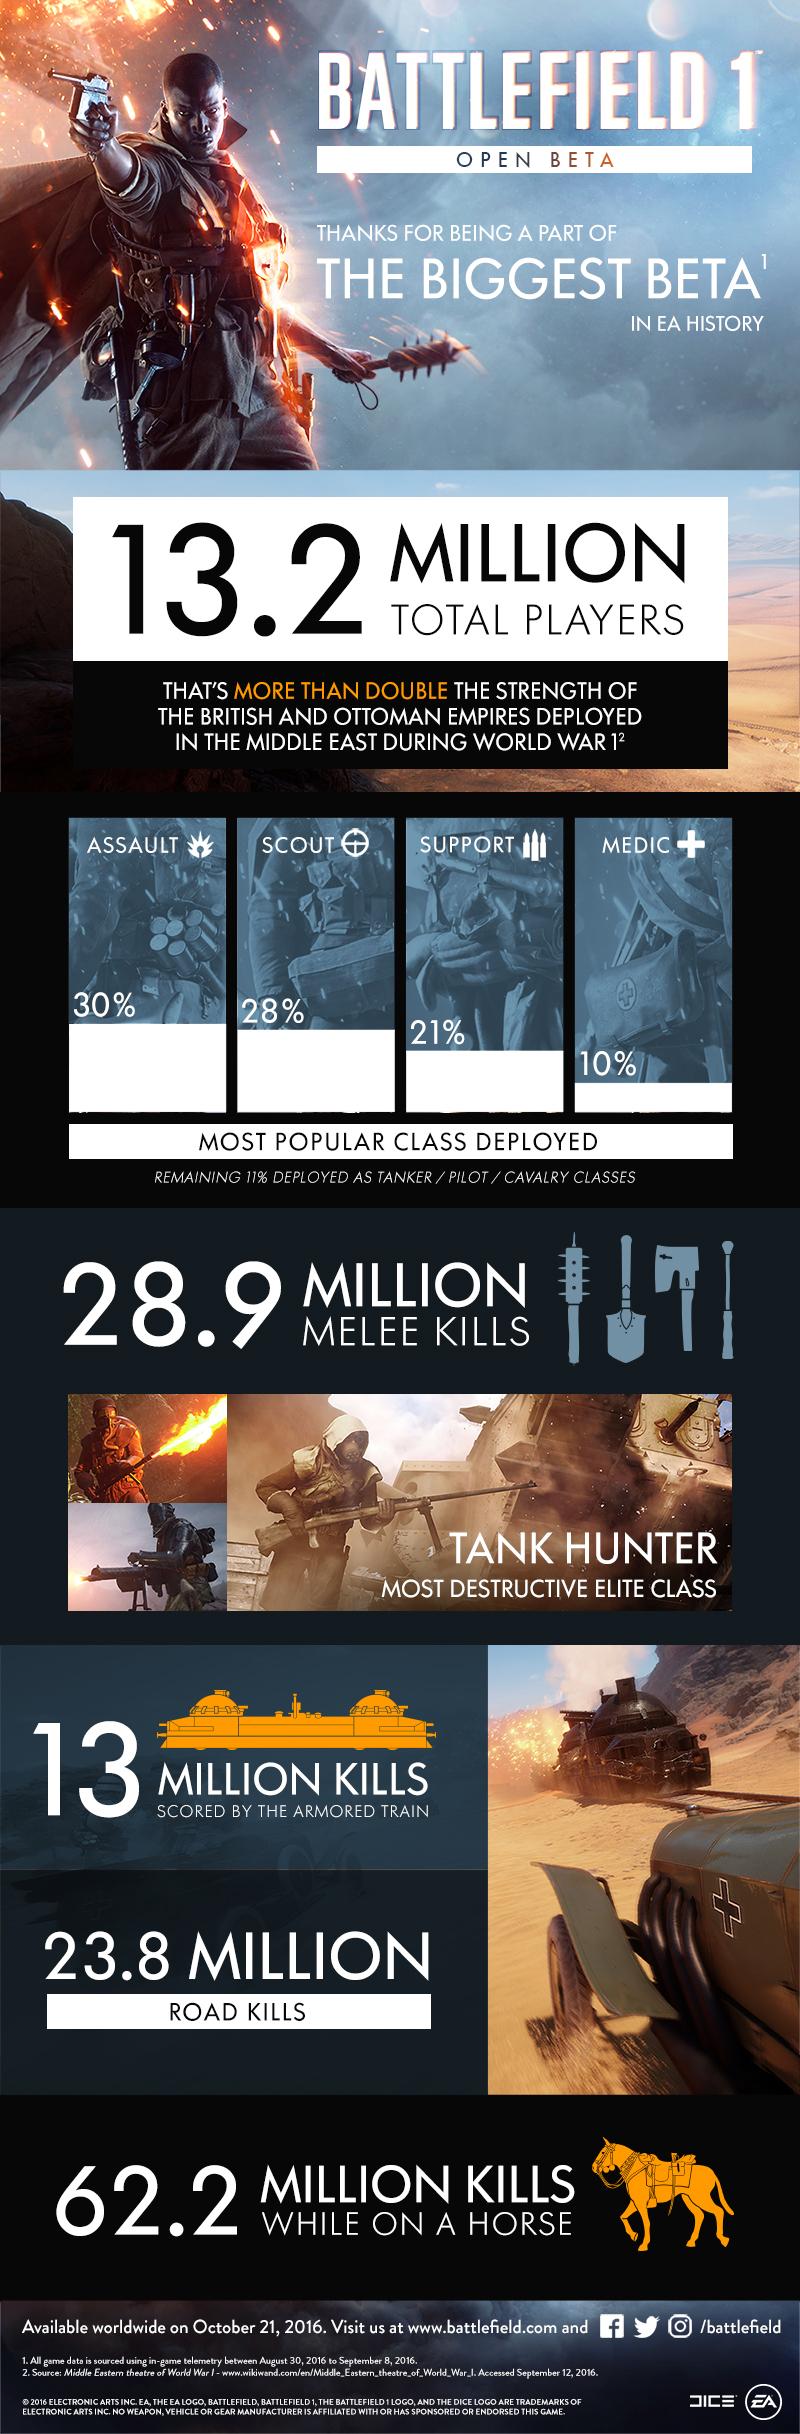 battlefield-1-open-beta-stats